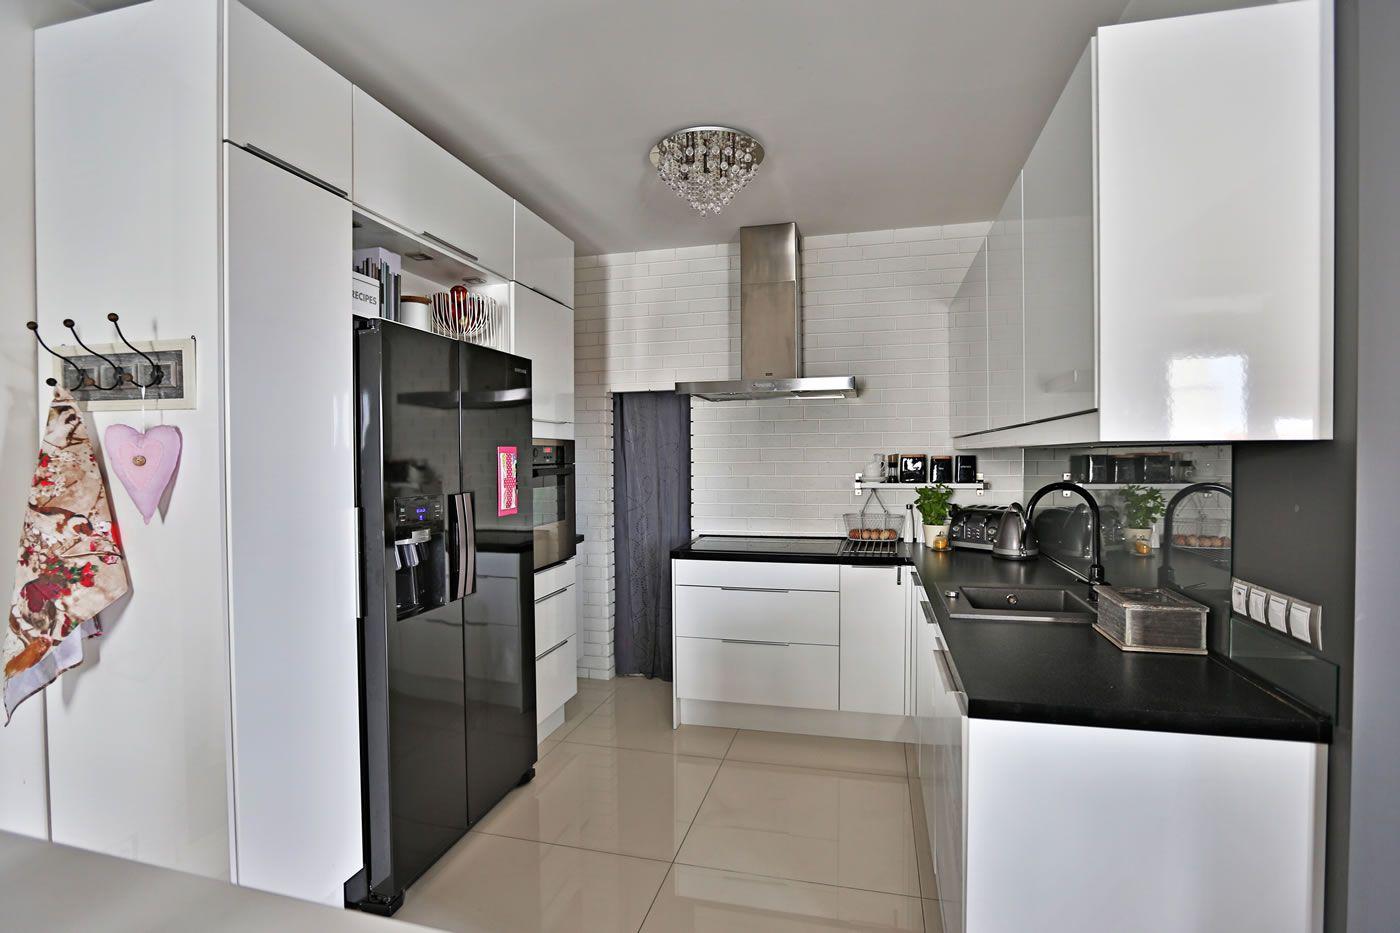 Pin By Edyta On Zabudowa Lodowki Side By Side Kitchen Remodel Kitchen Kitchen Cabinets